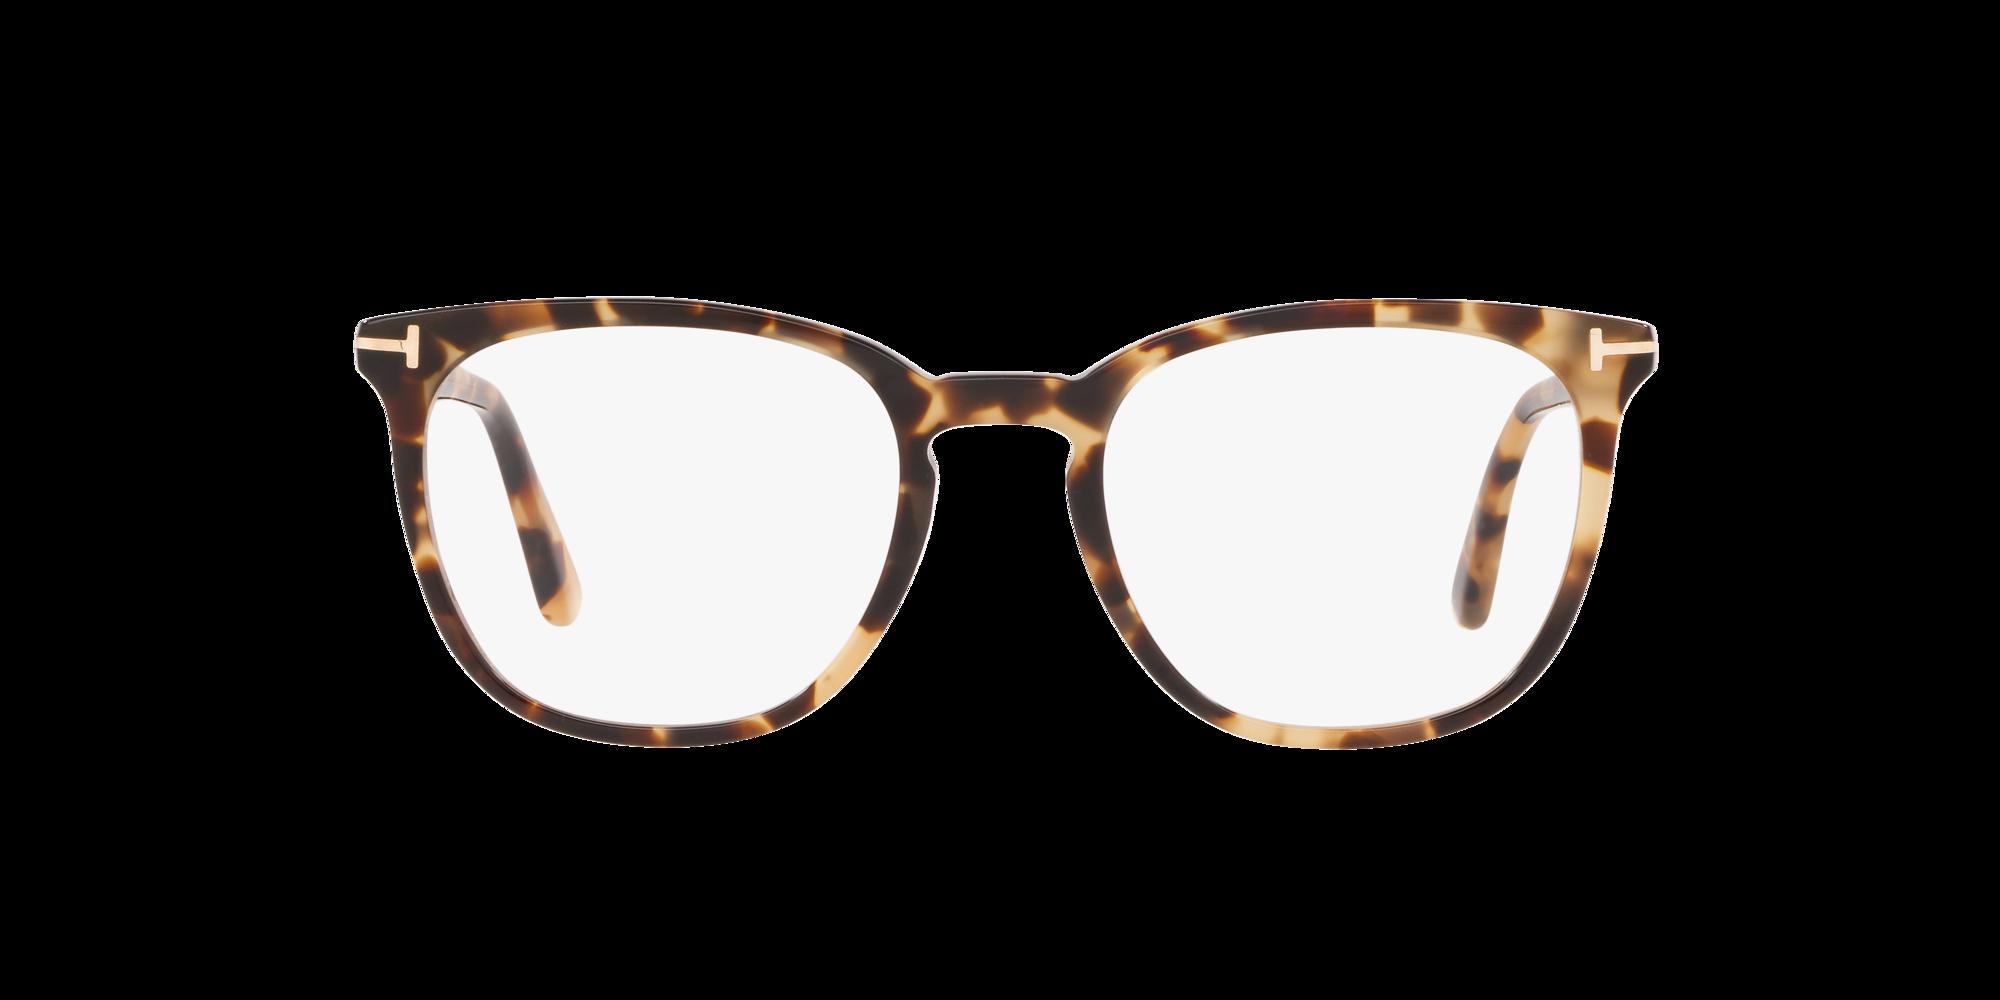 Image for FT5506 from LensCrafters | Glasses, Prescription Glasses Online, Eyewear